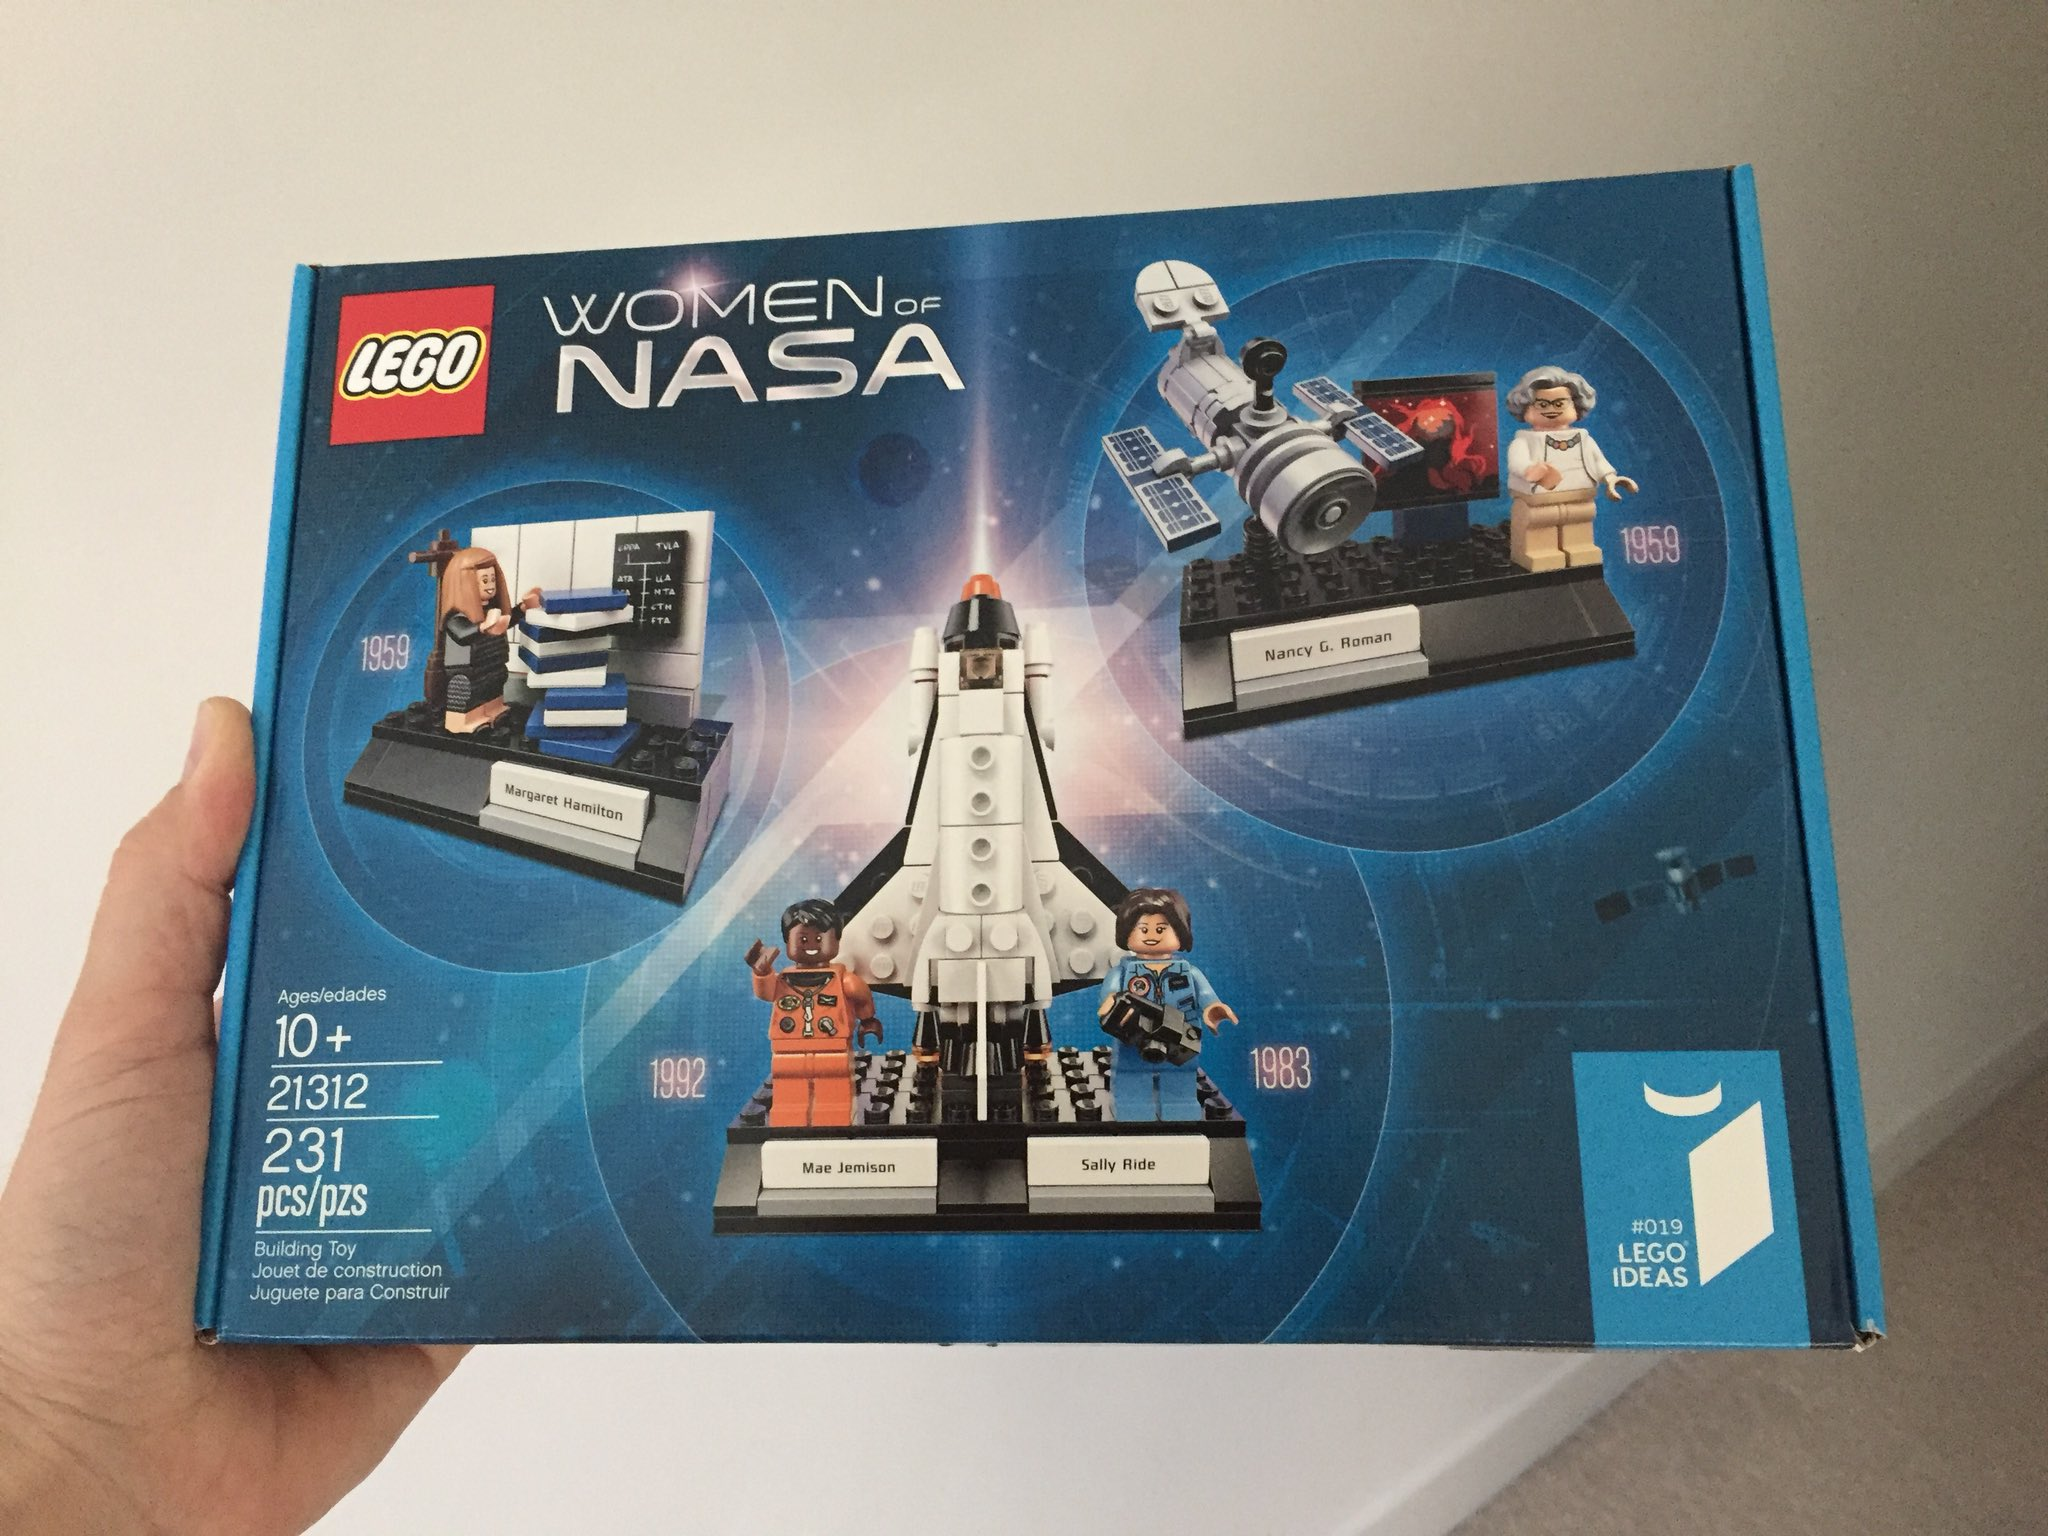 So, hey, LEGO sent me a thing... ゚ムᄅ゚マᄐ¬タペメᄏ゚ムᄅ゚マᄒ¬タペレタ゚ムᄅ゚マᄏ¬タペレタ゚ムᄅ゚マᄏ¬タペマᆱ #LEGOWomenofNASA ゚レタ https://t.co/CNopoQcq3c